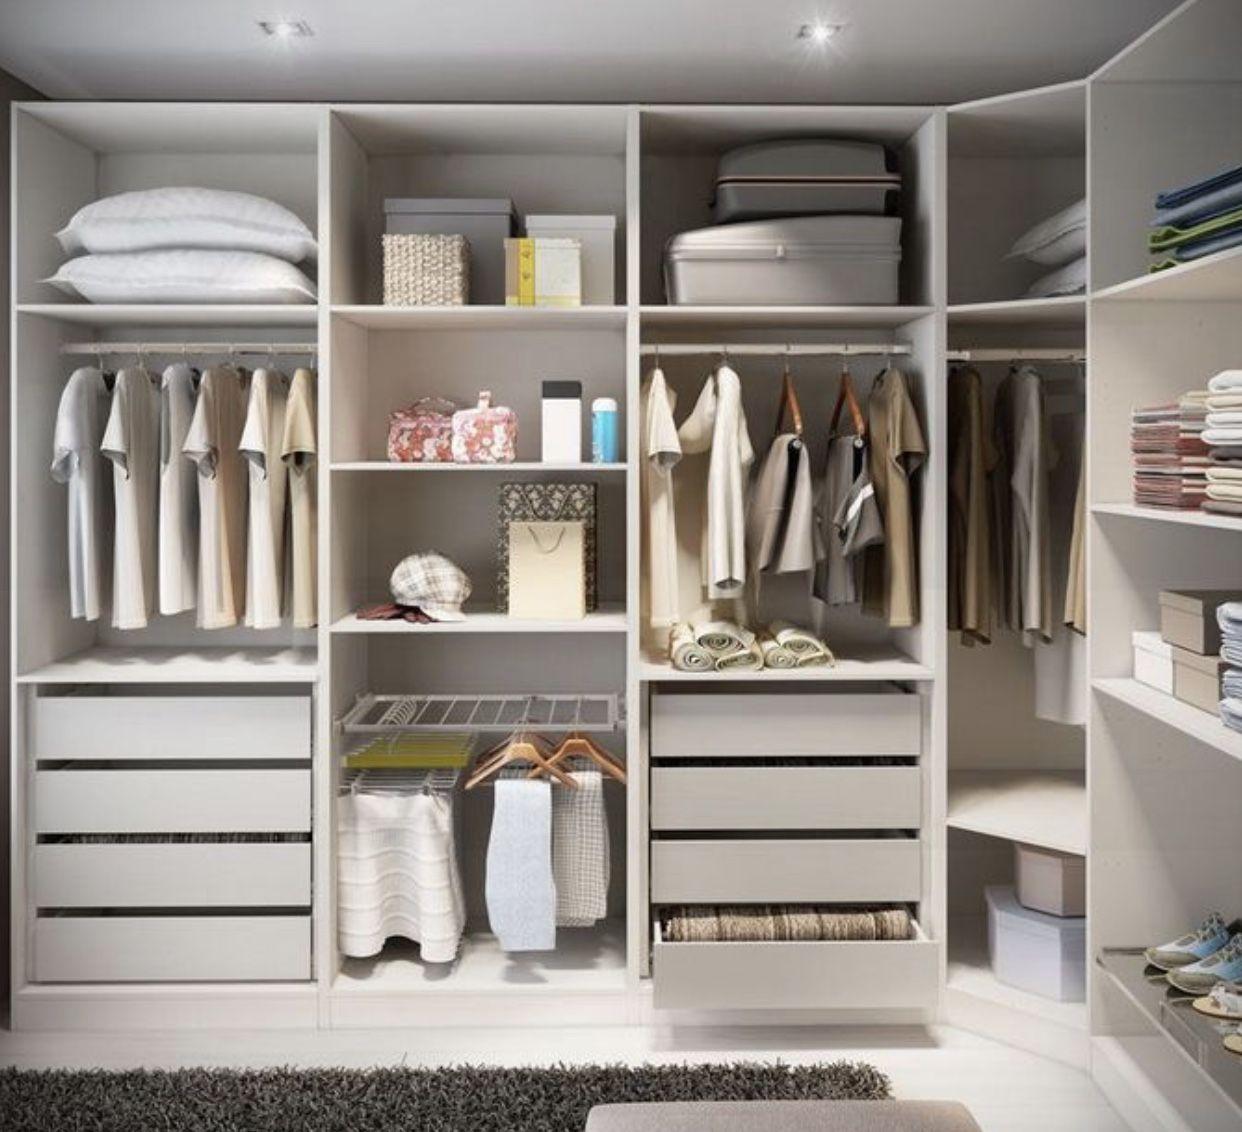 تفصيل غرف معاريس اطفال خزائن مبتكره الرياض المصداقيه هو شعارنا يوج Closet Designs Walk In Closet Ikea Small Space Closet Design